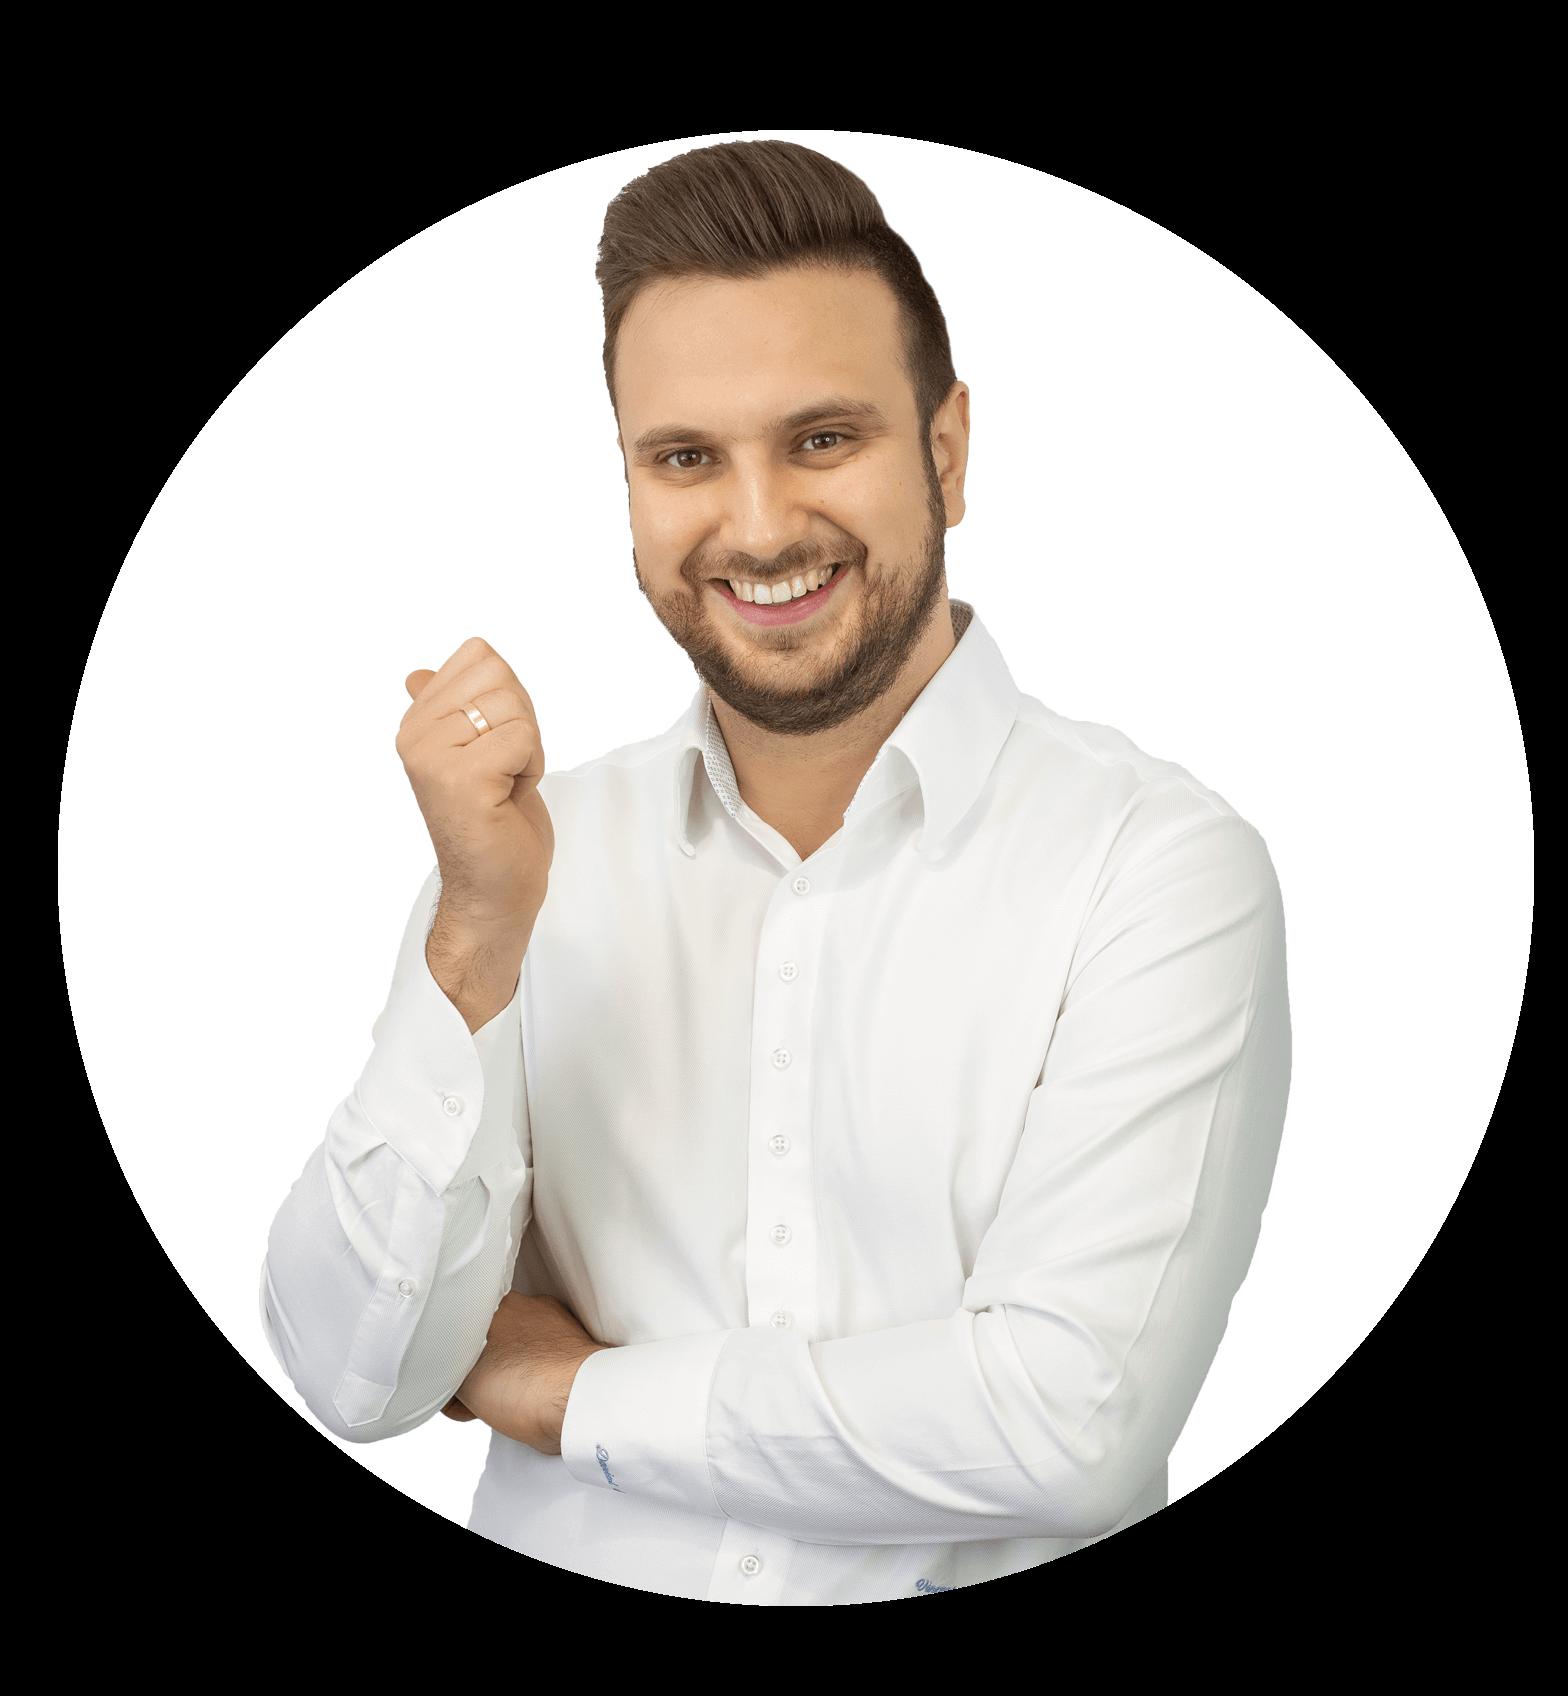 Daniel Siwiec - Deweloper, Inwestor, Mentor